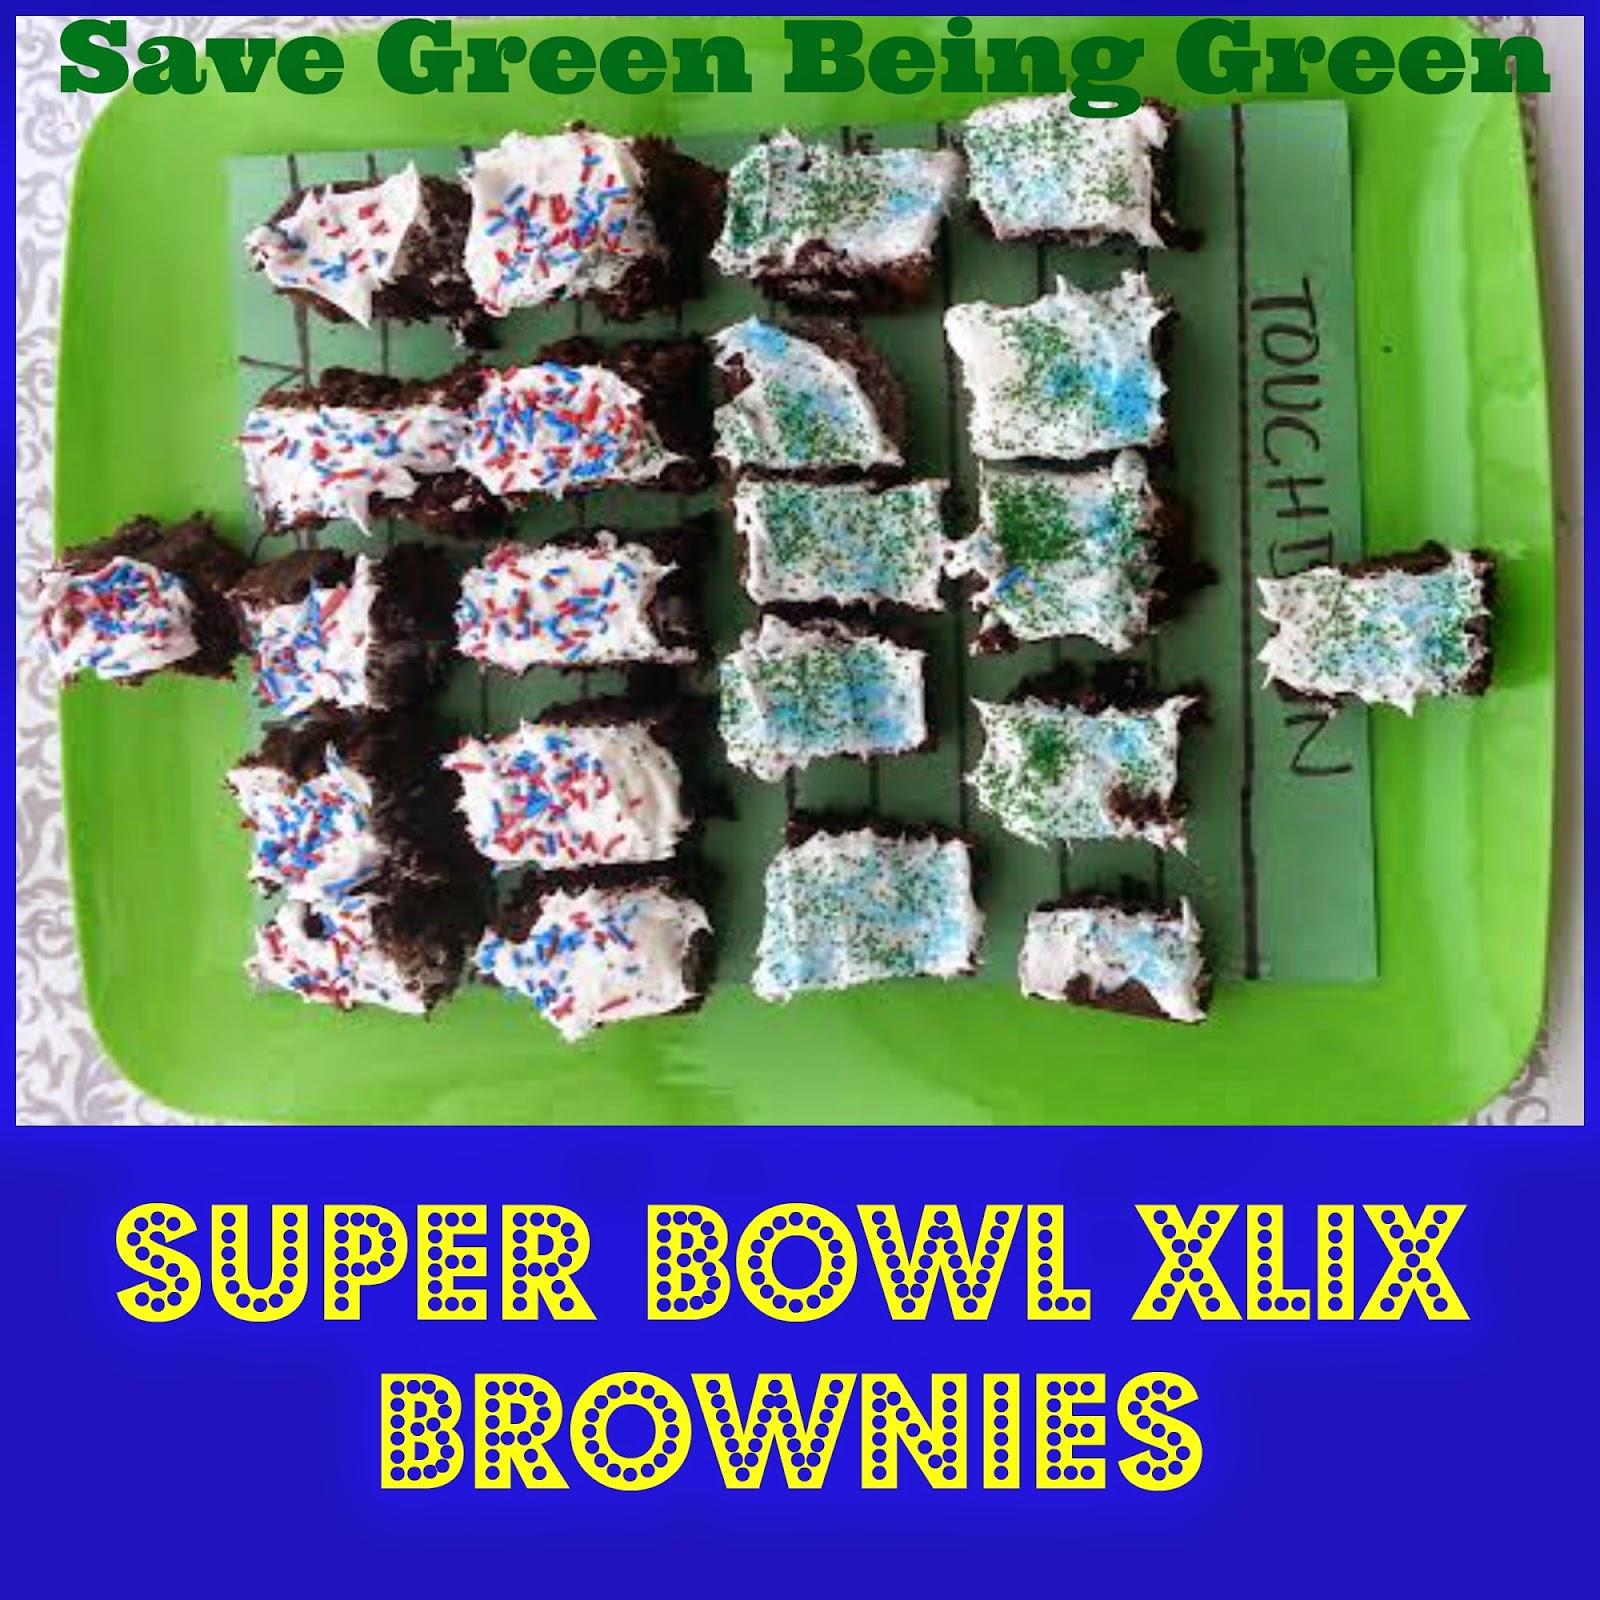 Save Green Being Green Super Bowl Xlix Brownies